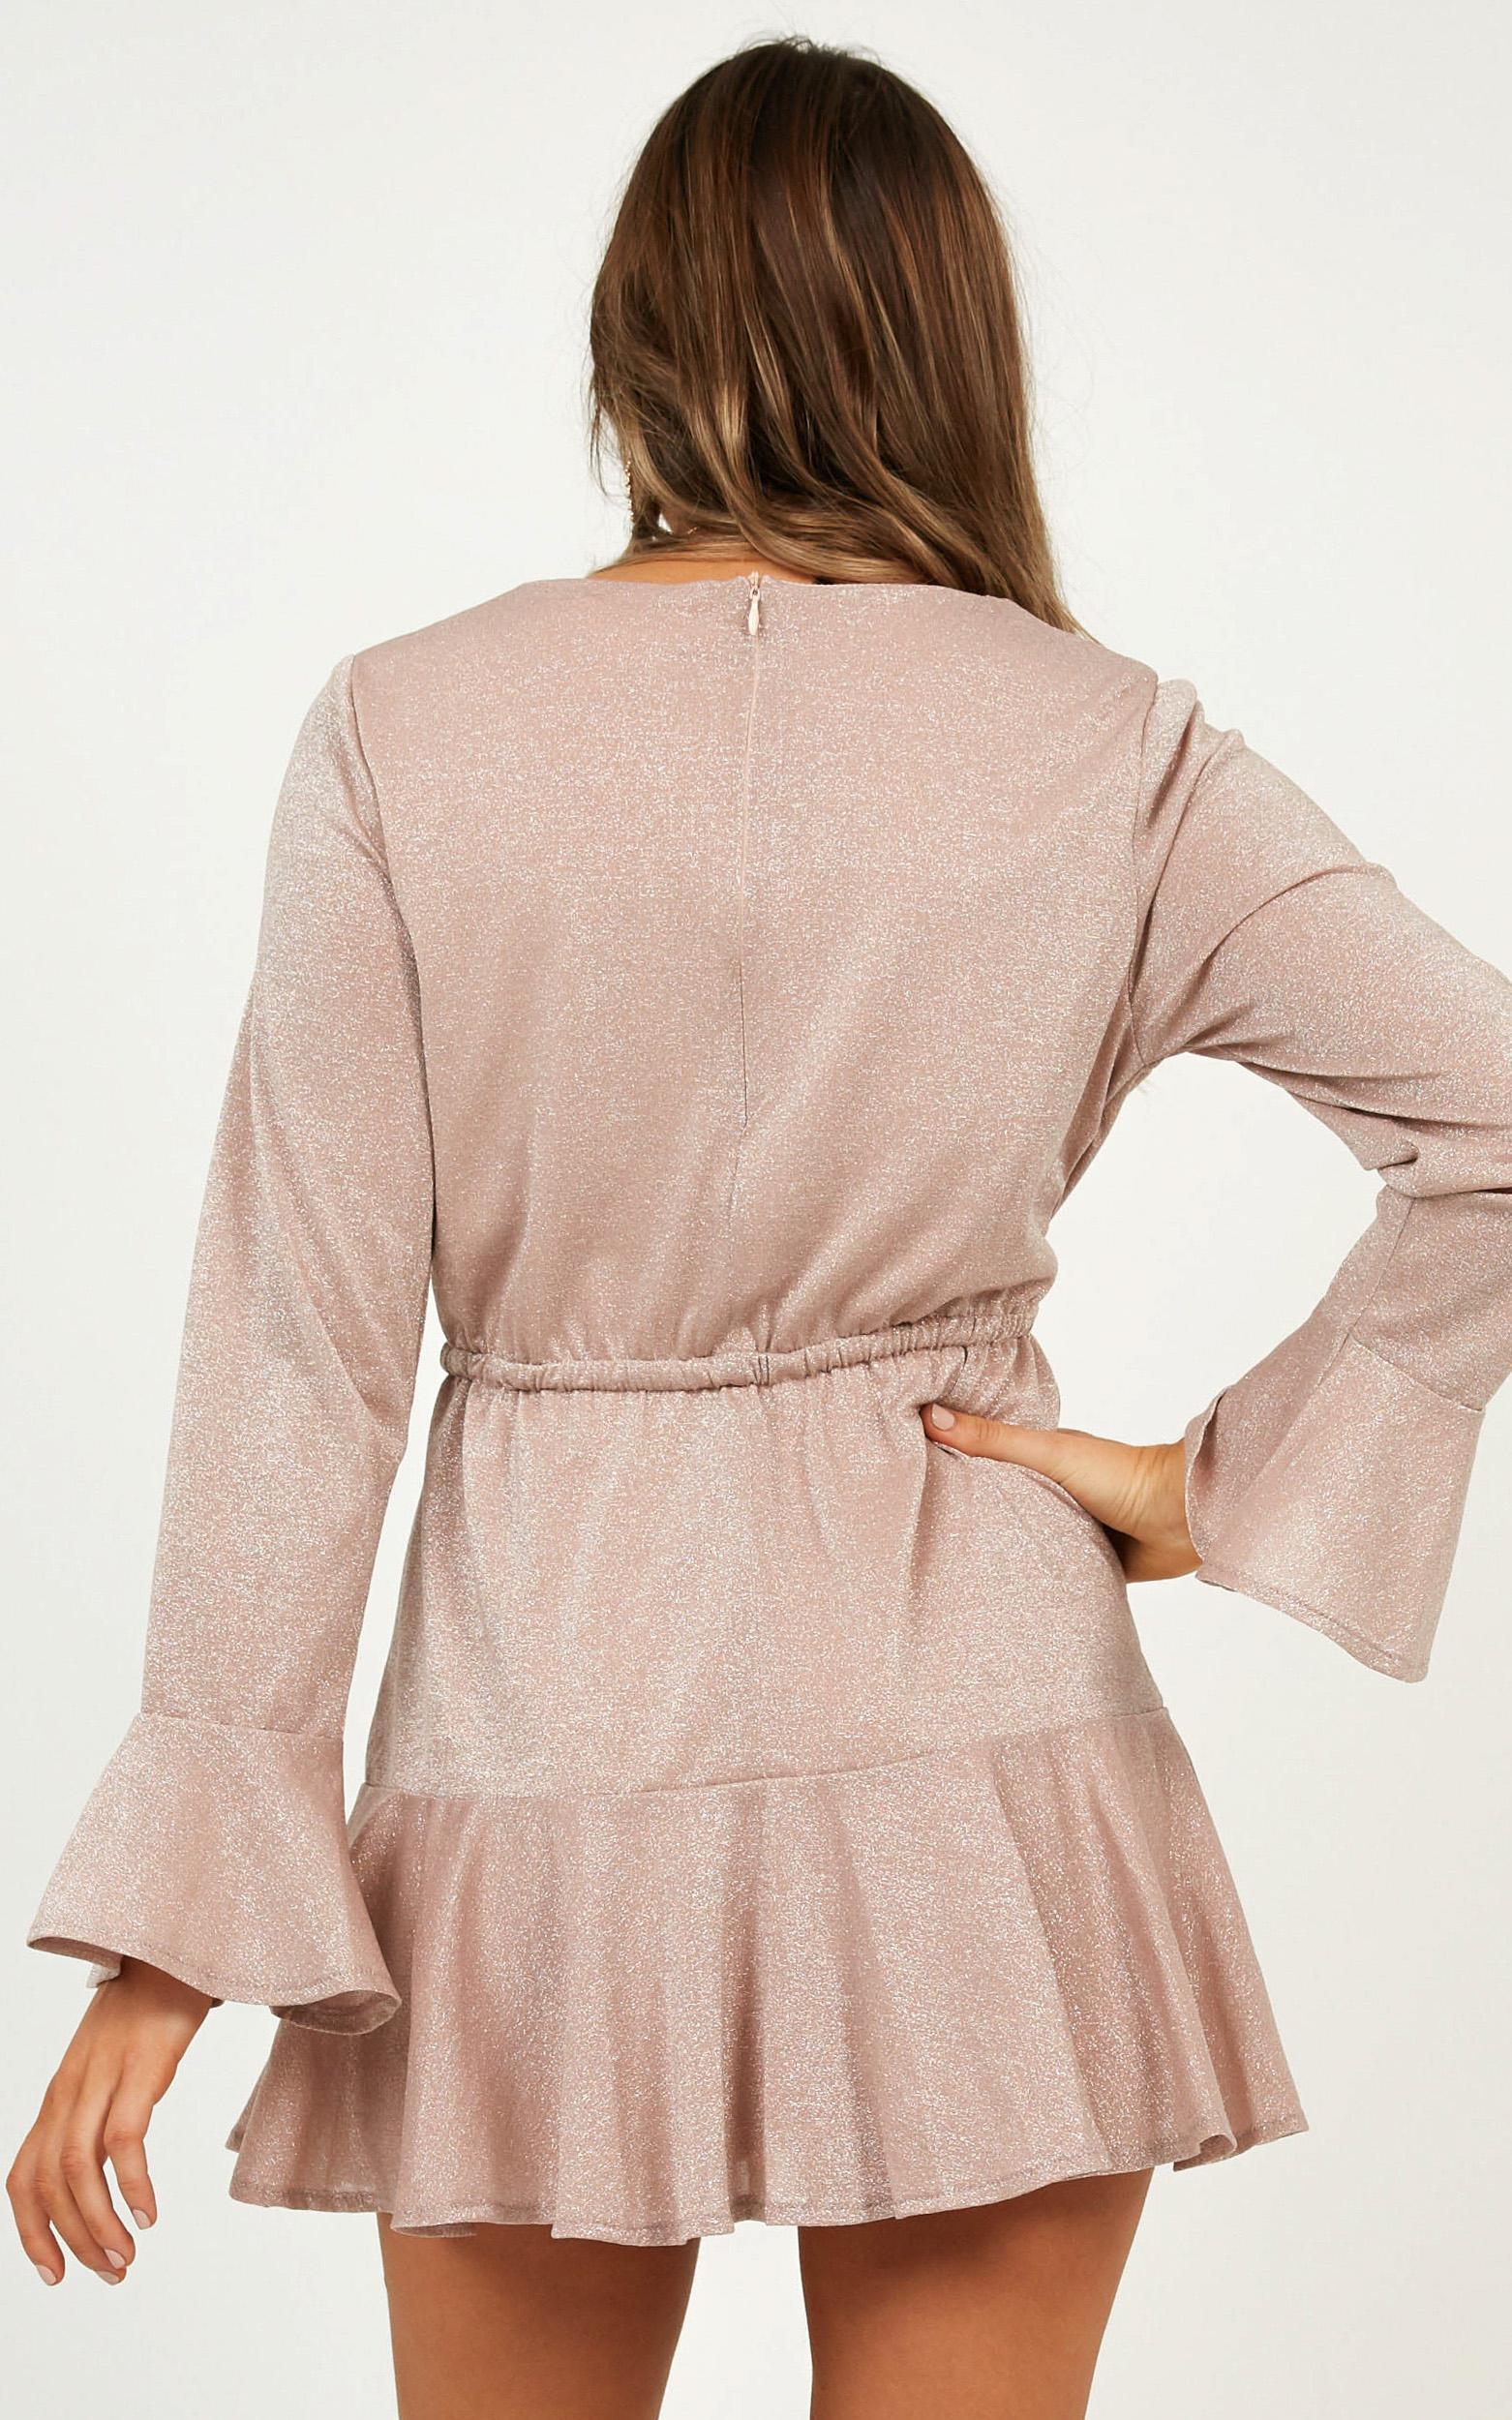 Faithful Reminder Dress in Blush - 12 (L), Blush, hi-res image number null